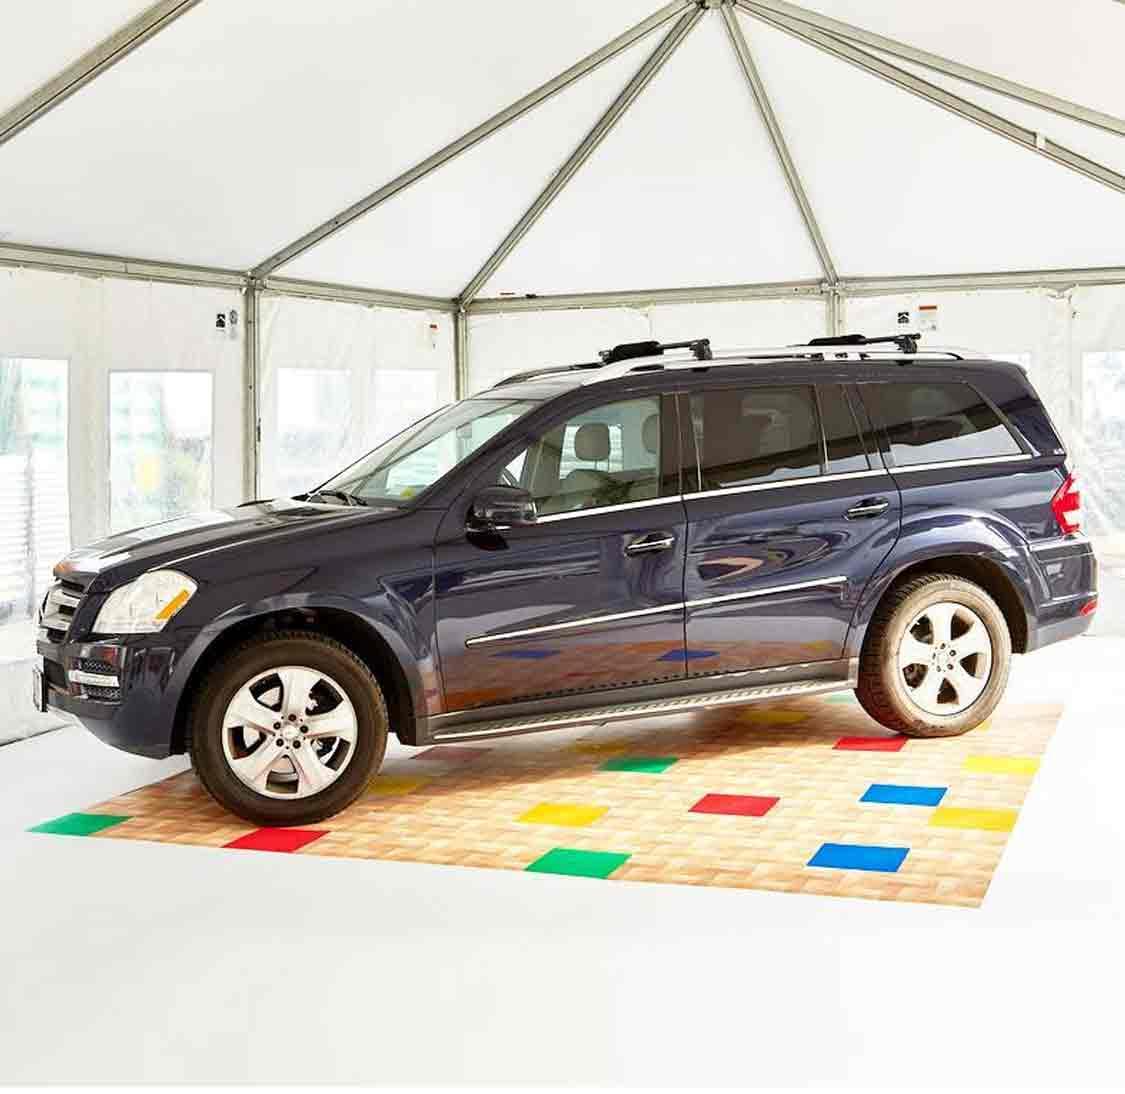 A car on top of EverBlock Flooring tiles